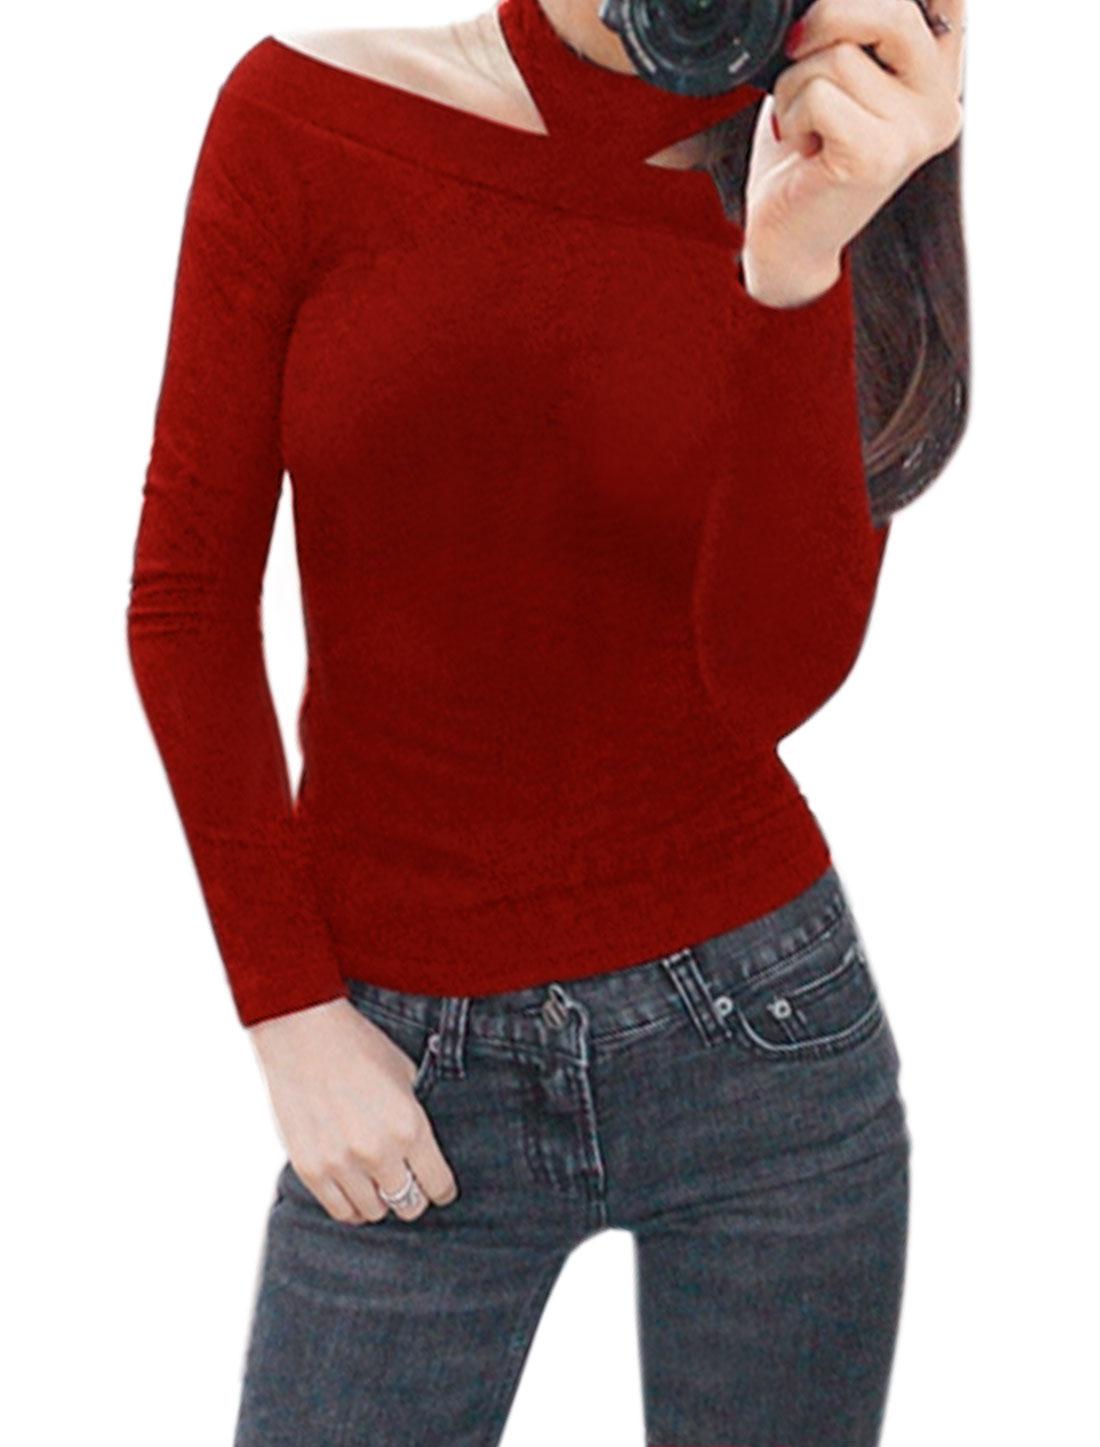 Women Long Sleeves Off Shoulder Slim Fit Halter Top Red XS